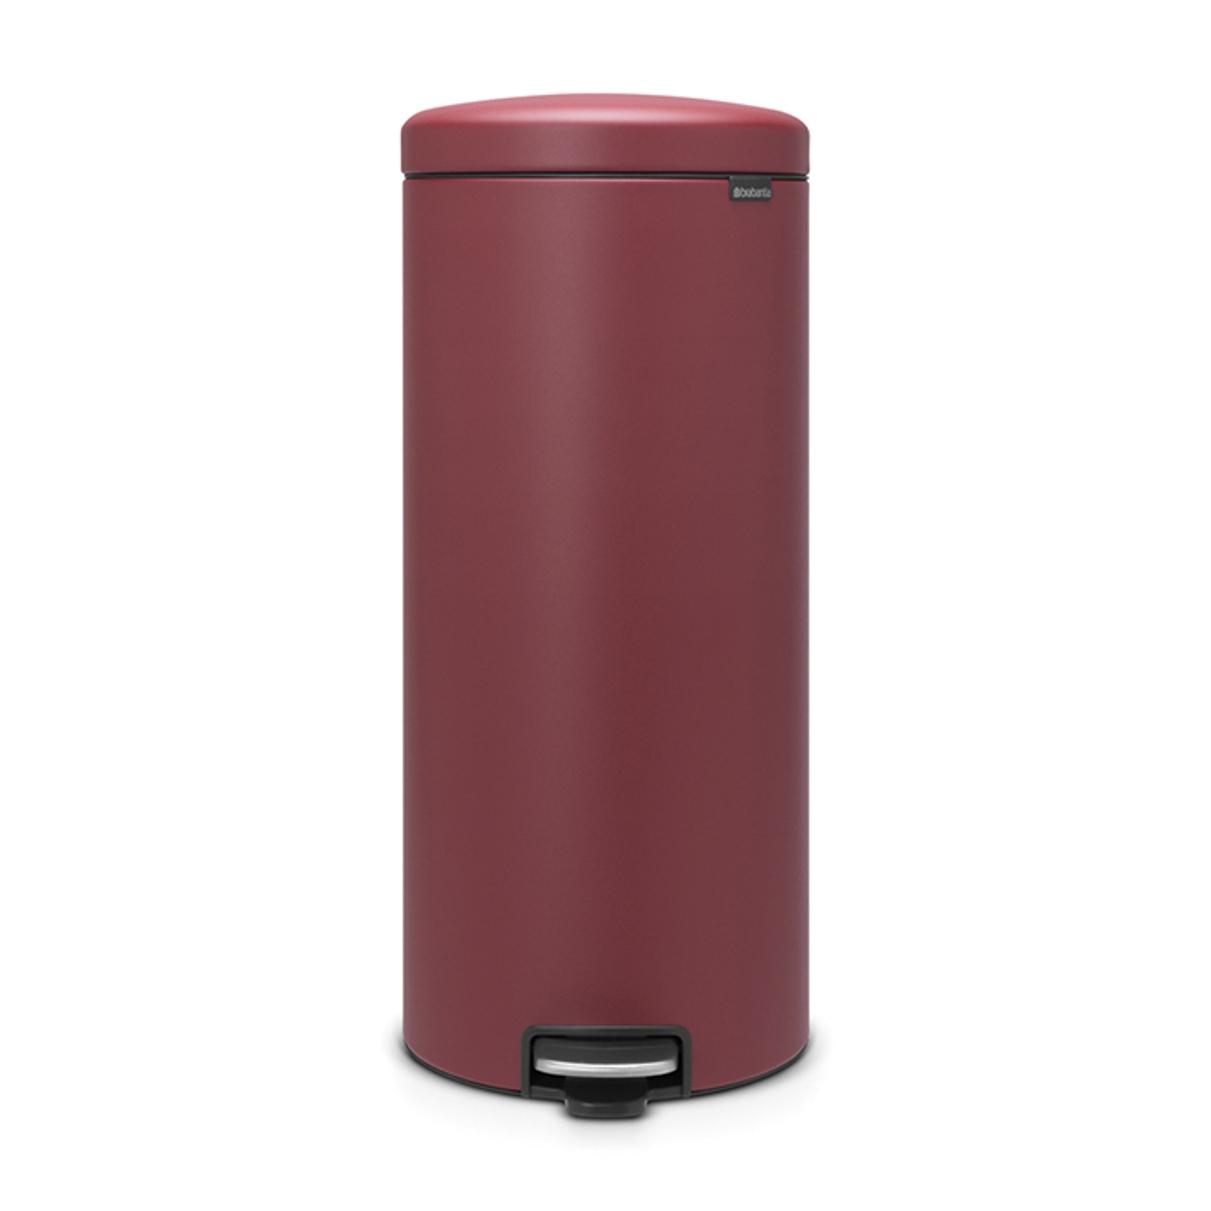 Онлайн каталог PROMENU: Бак для мусора Pedal Bin Brabantia newIcon, объем 30 л, бордовый Brabantia 115981